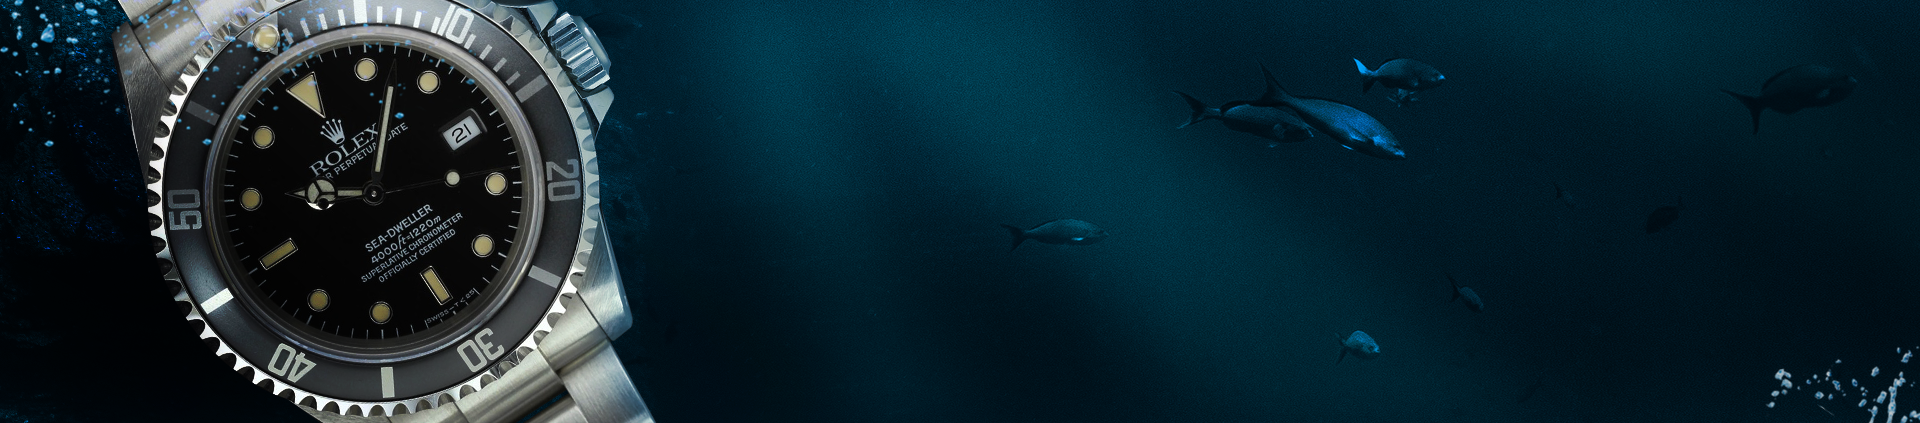 SEA DWELLER